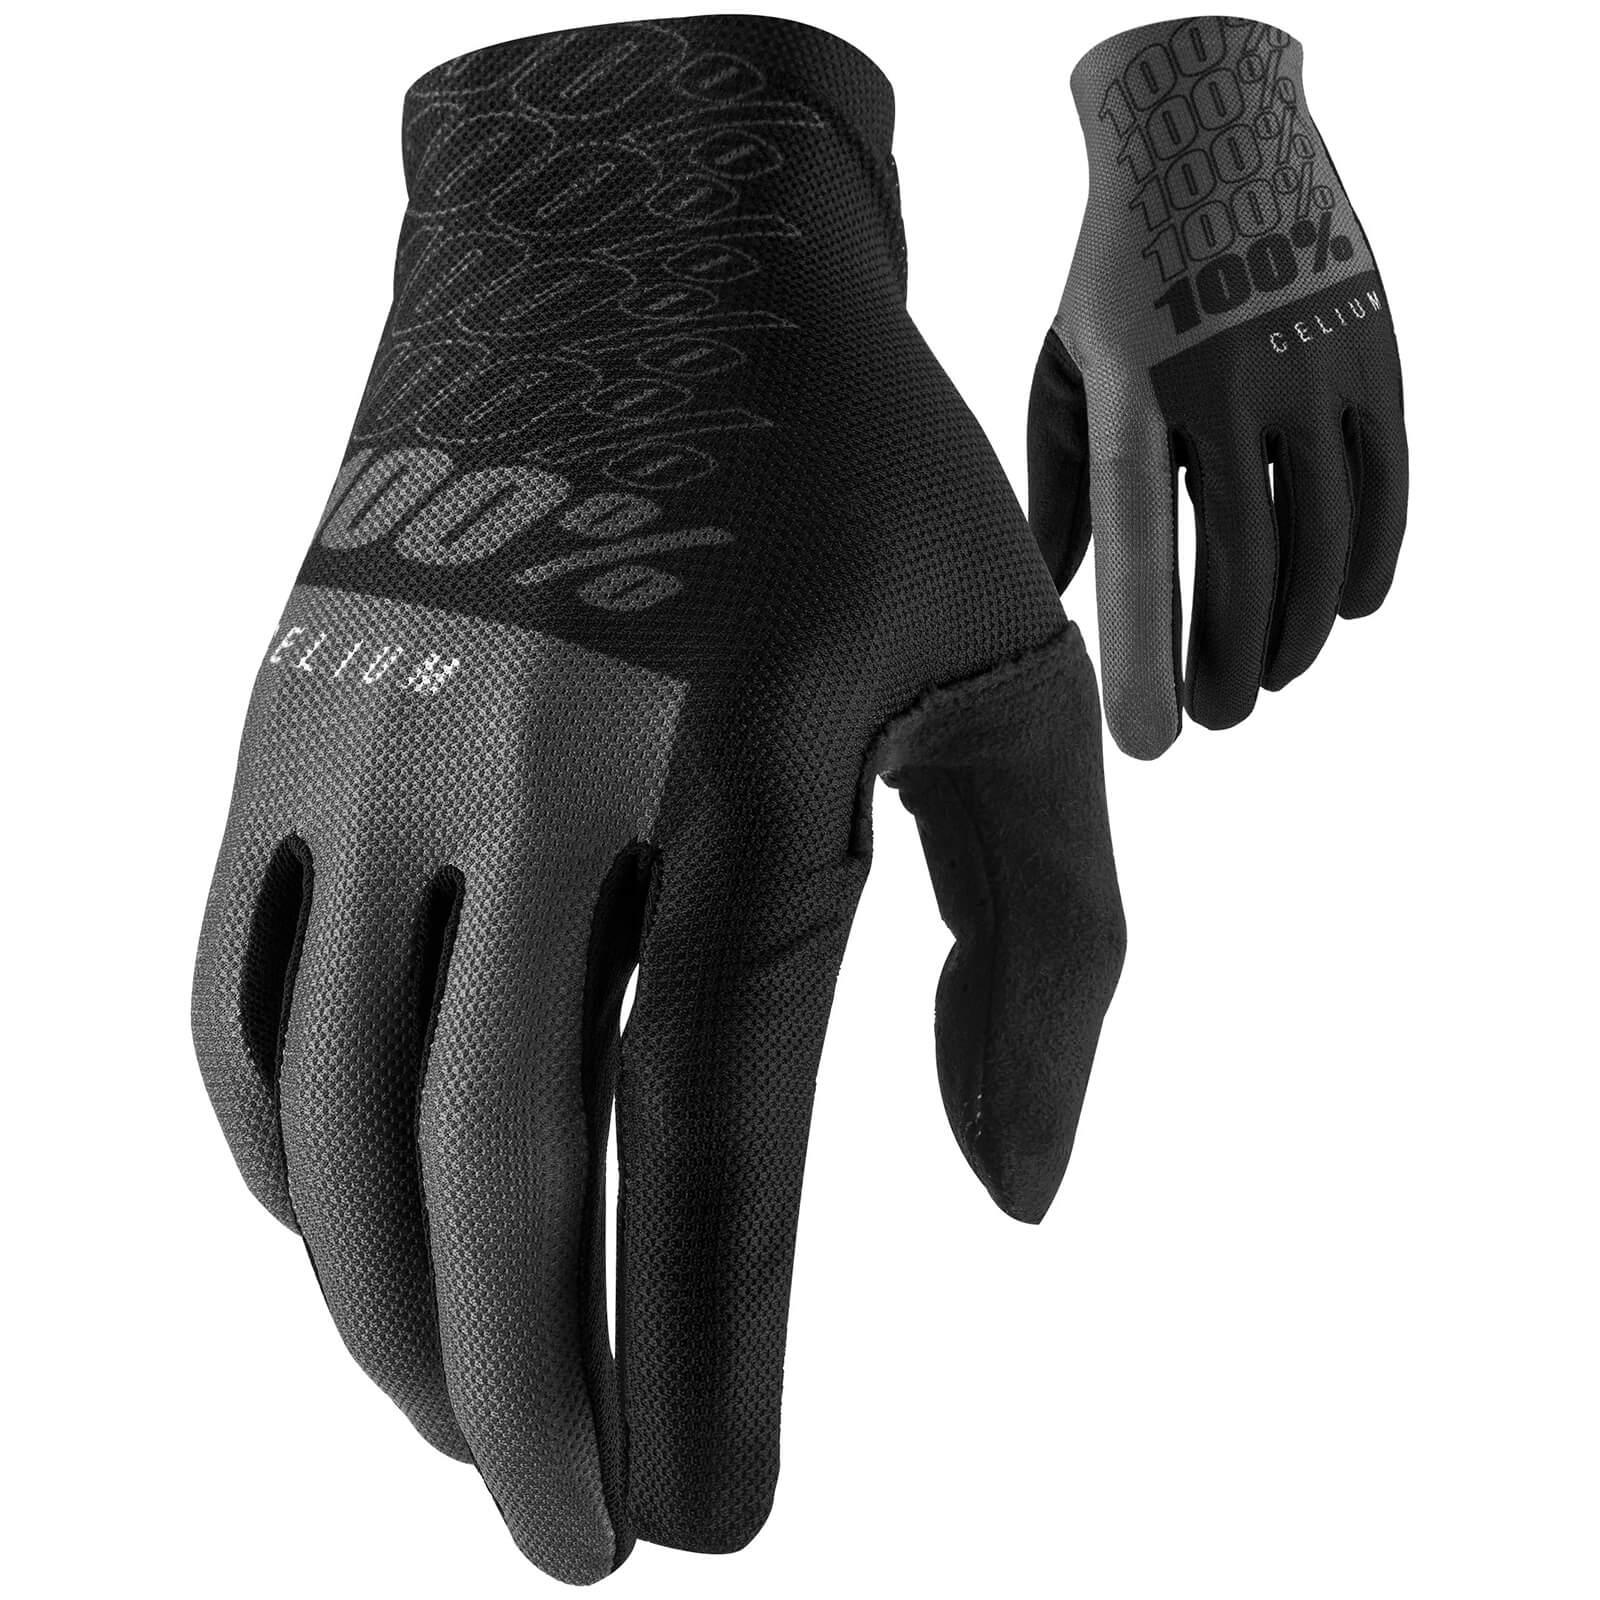 Image of 100% Celium MTB Gloves - S - Black/Grey